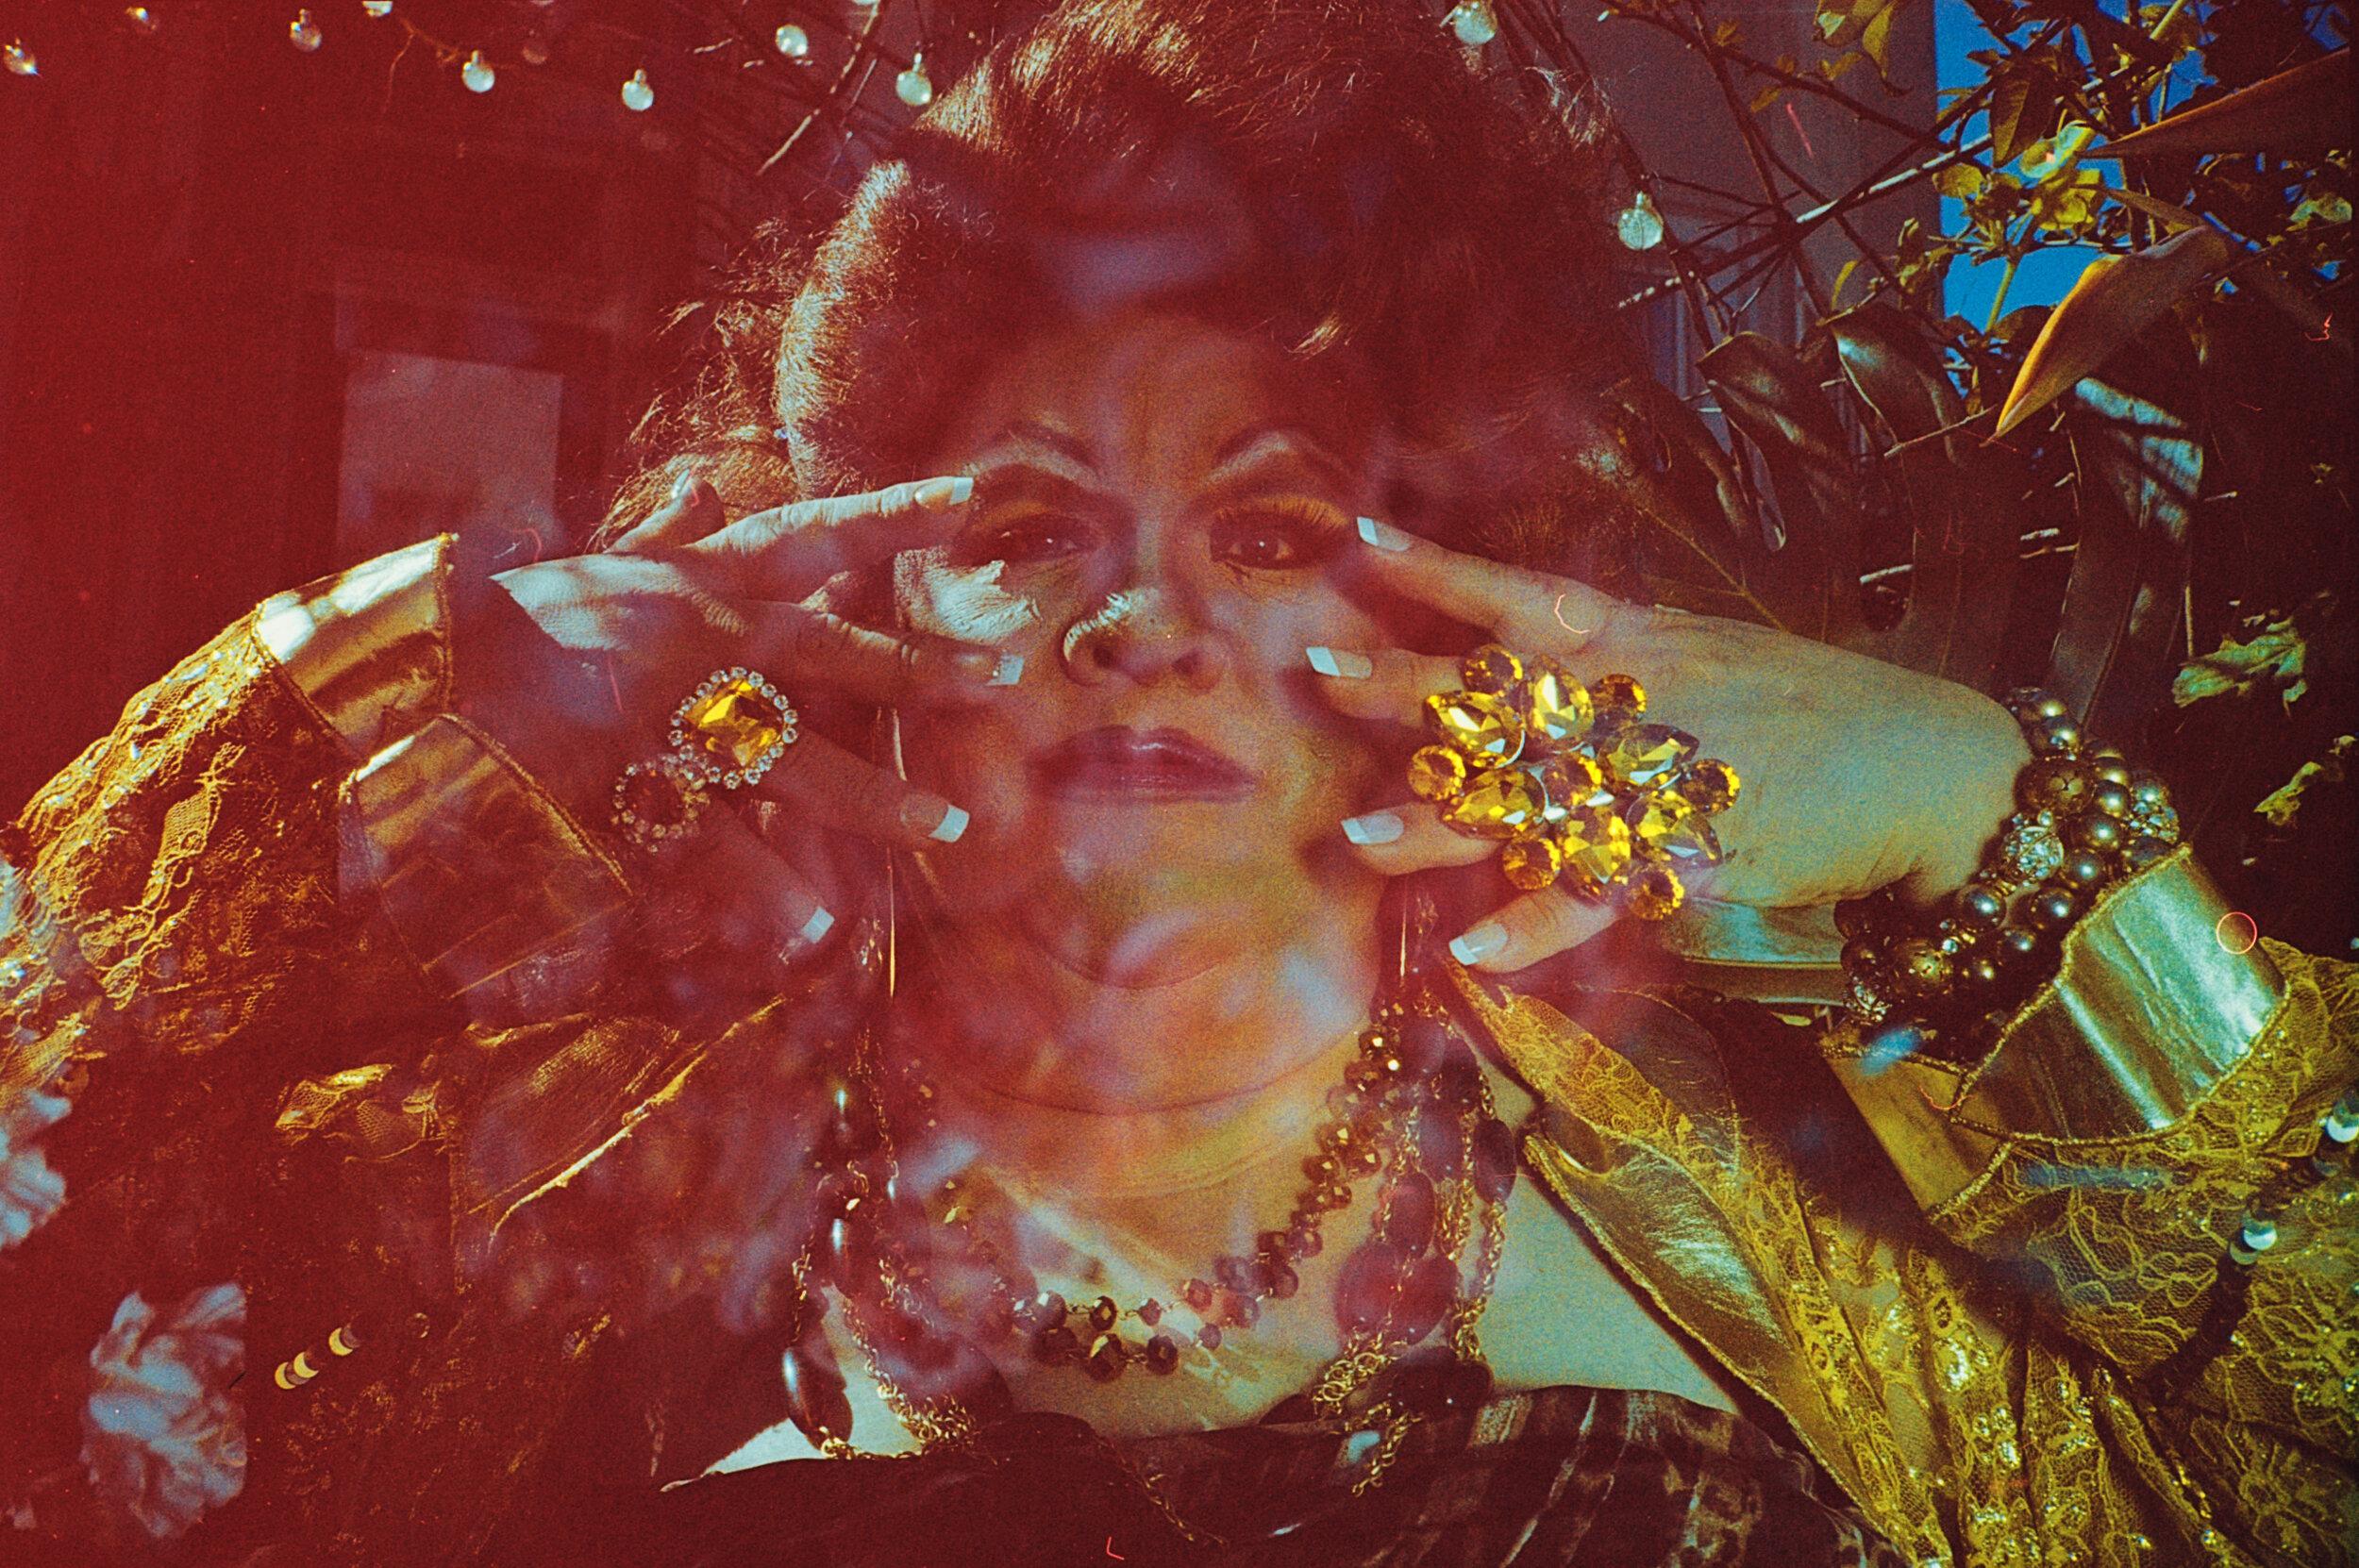 San Francisco Drag Legend, Renita Valdez